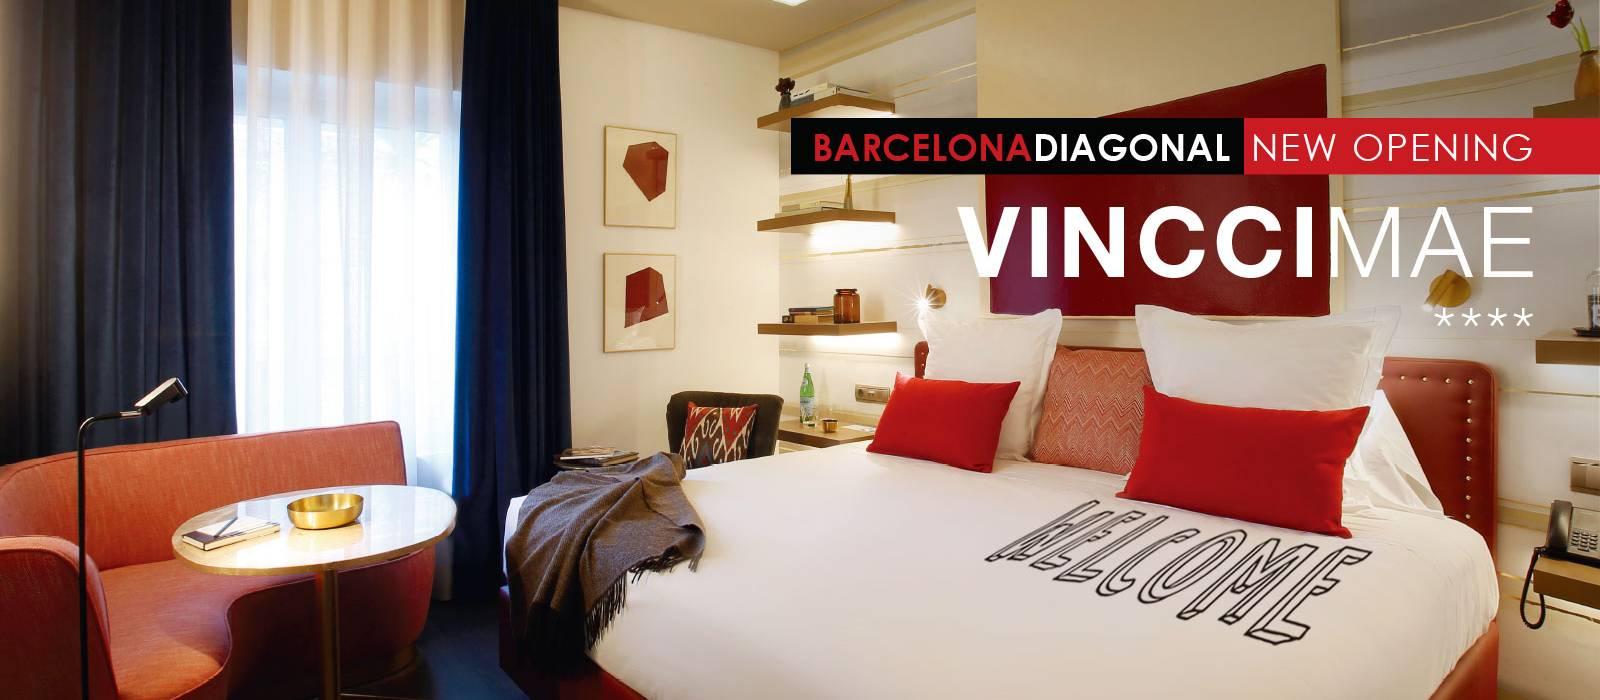 Vincci Mae 4* - Barcelona